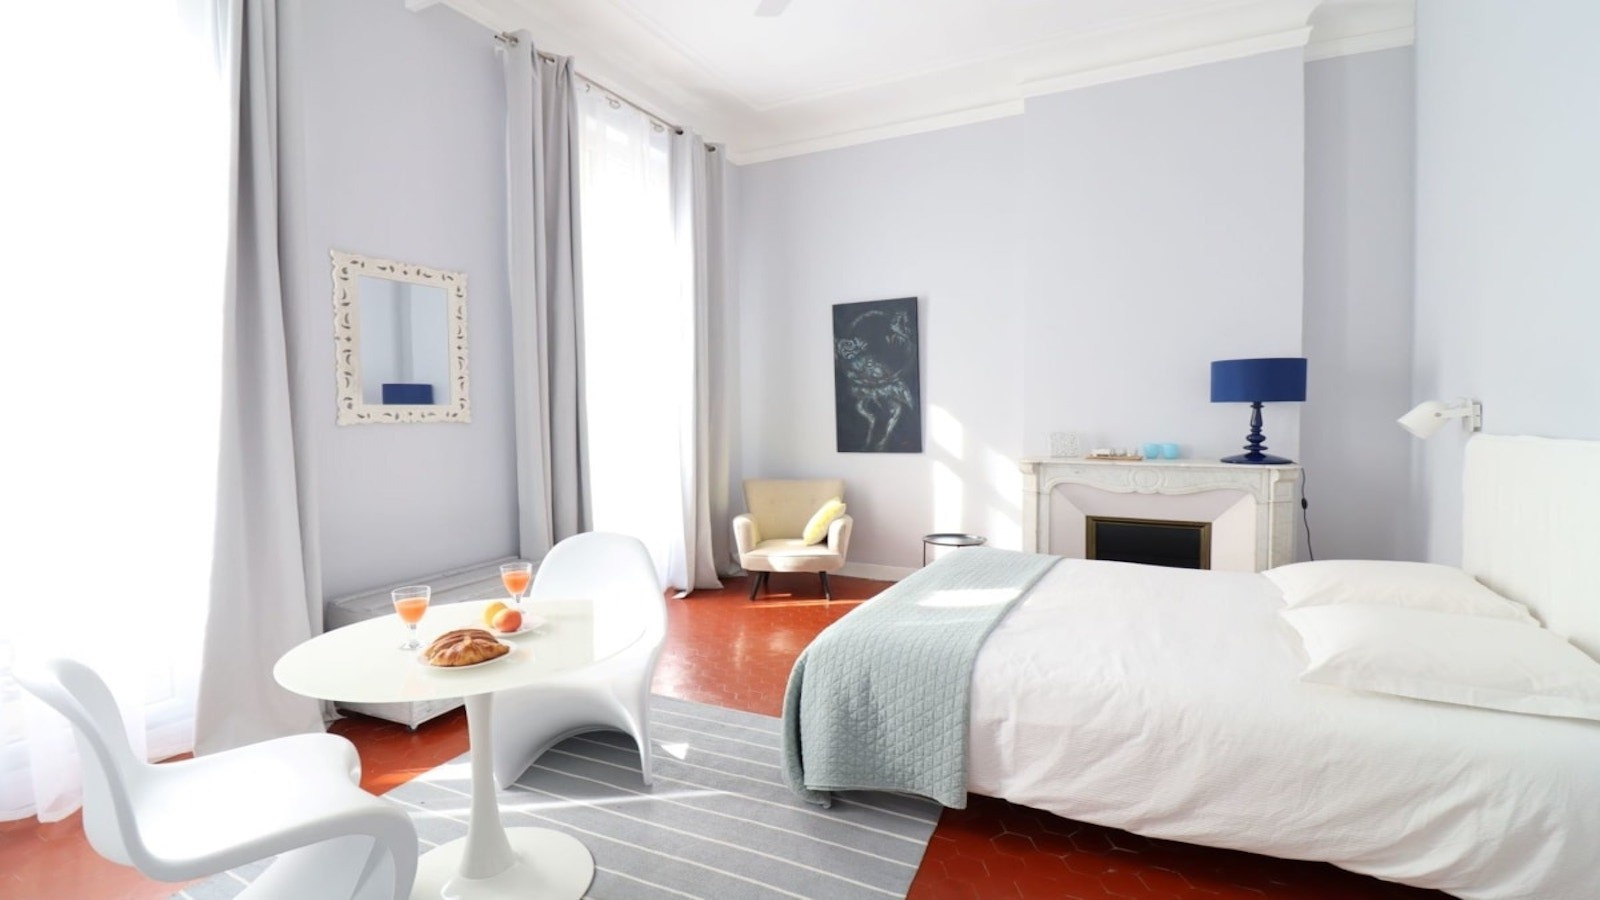 Maison Dormoy client Ododo